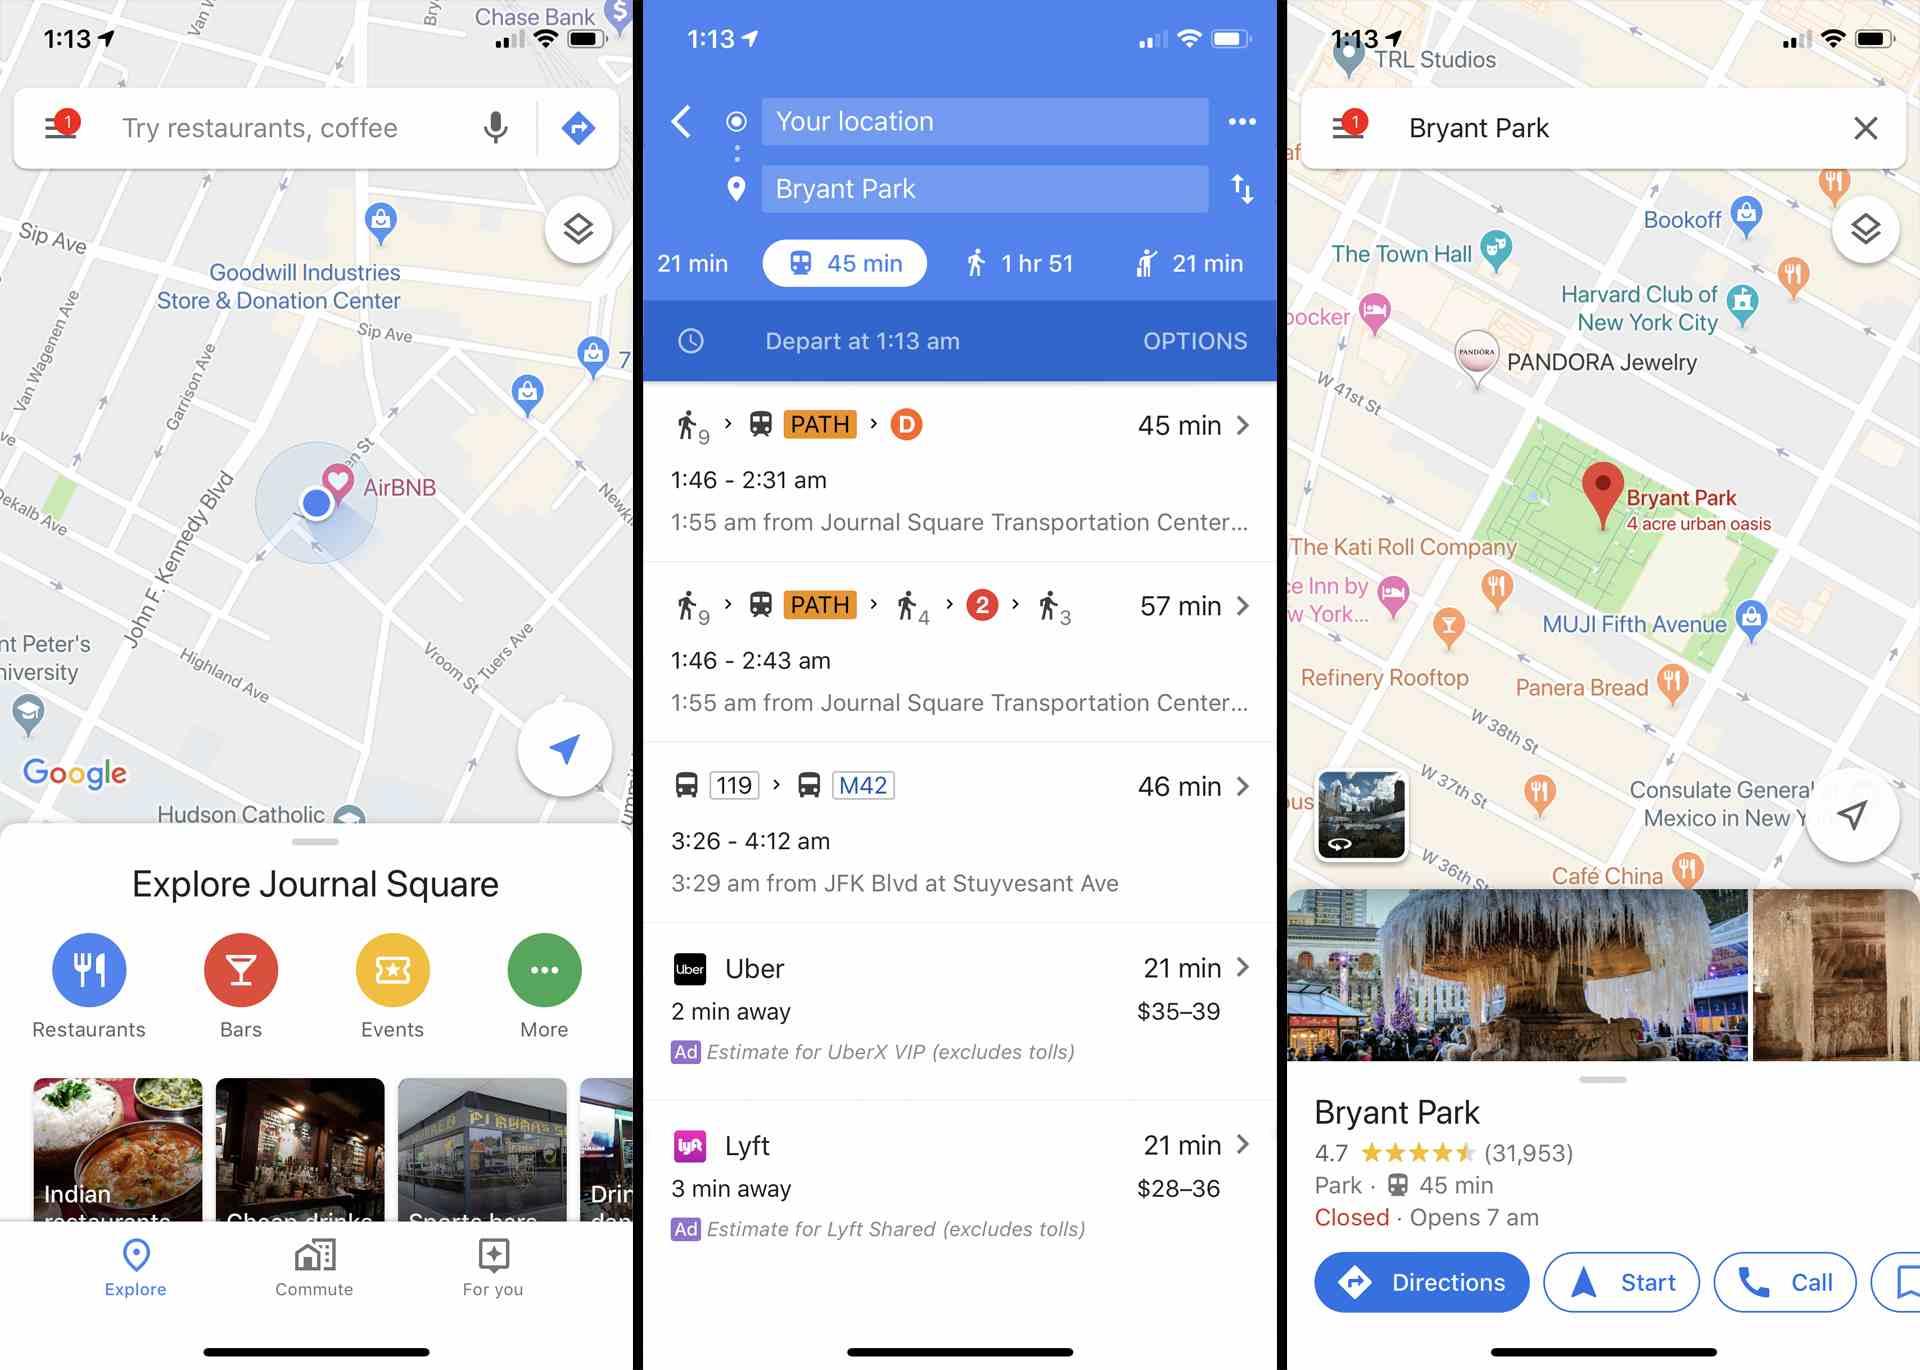 Google Maps iOS app on iPhone.